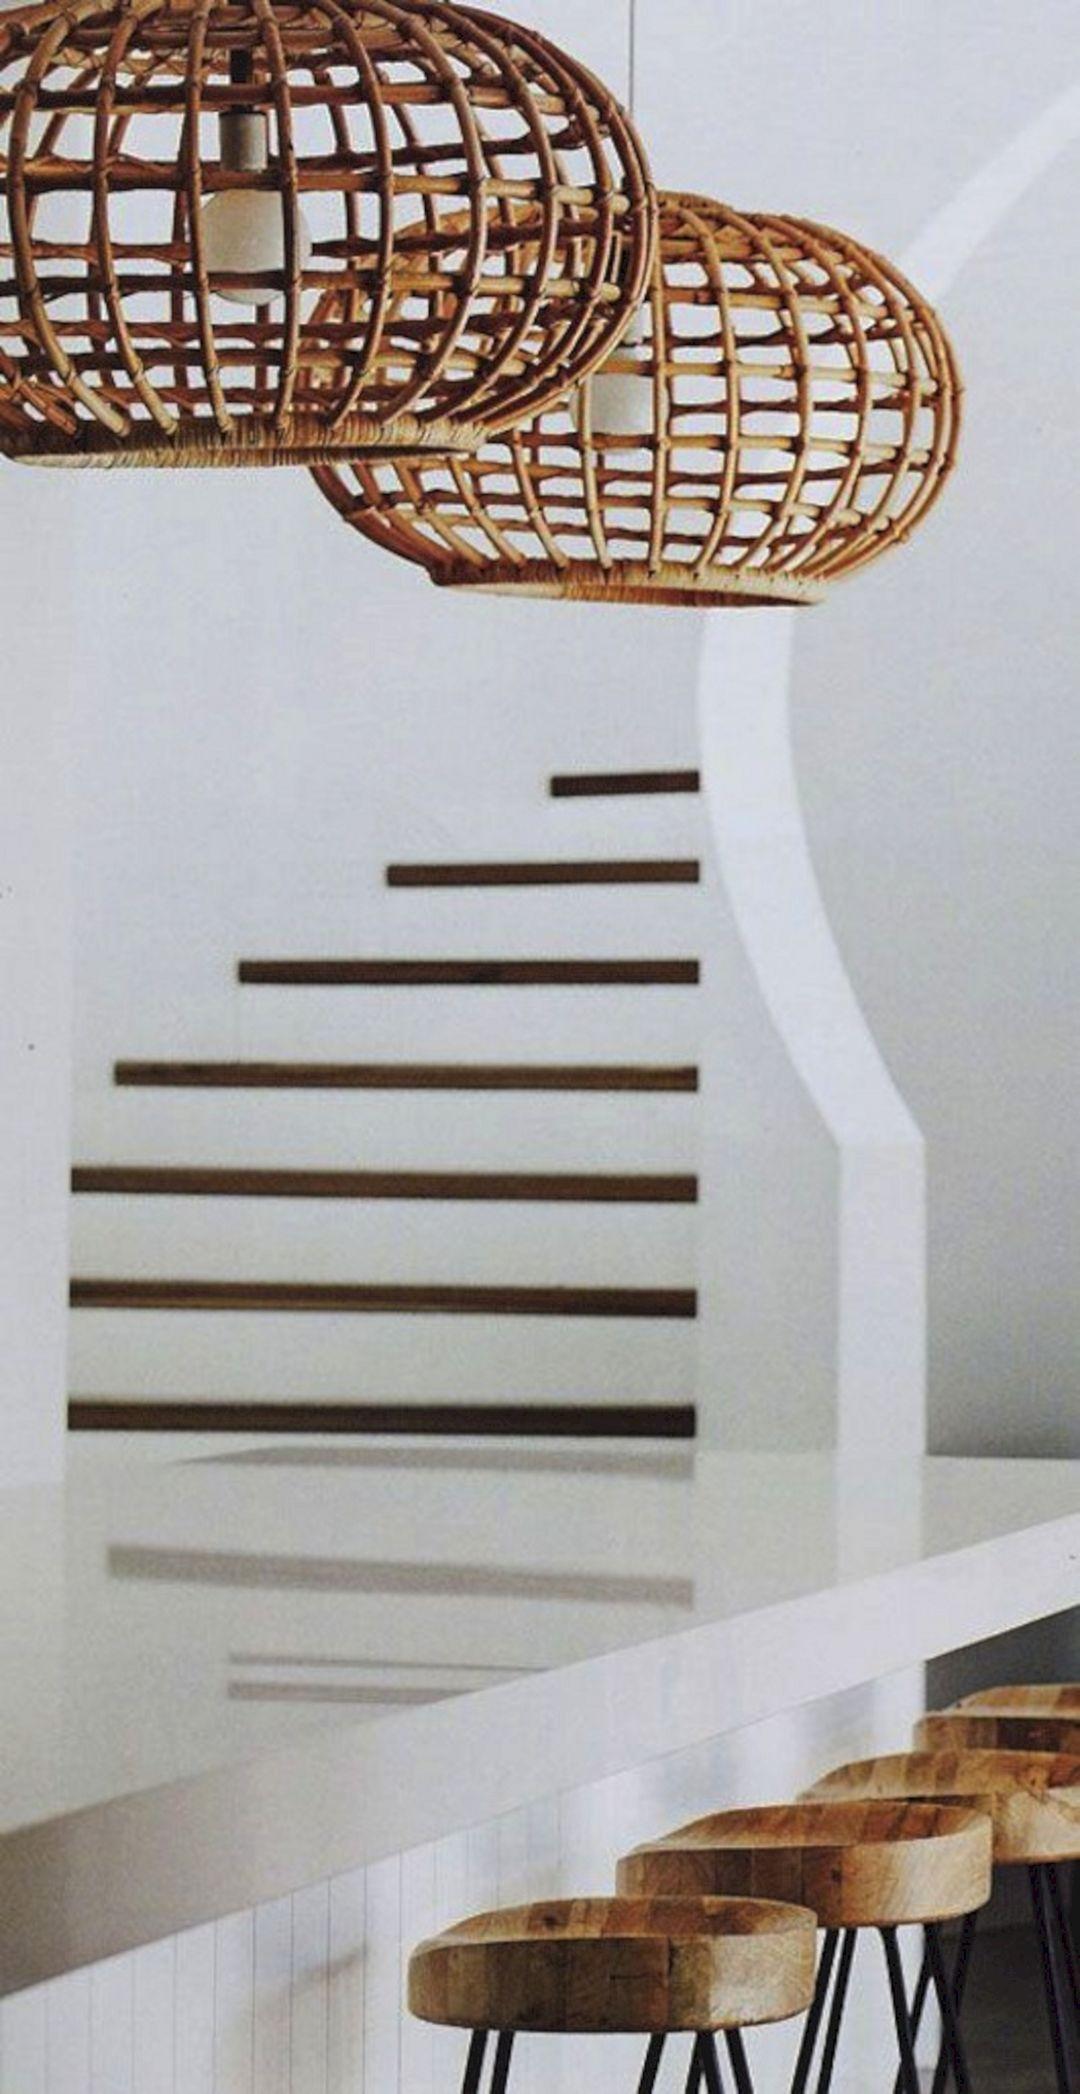 Woven Basket Lamp Shade : Wicker basket lamp shades